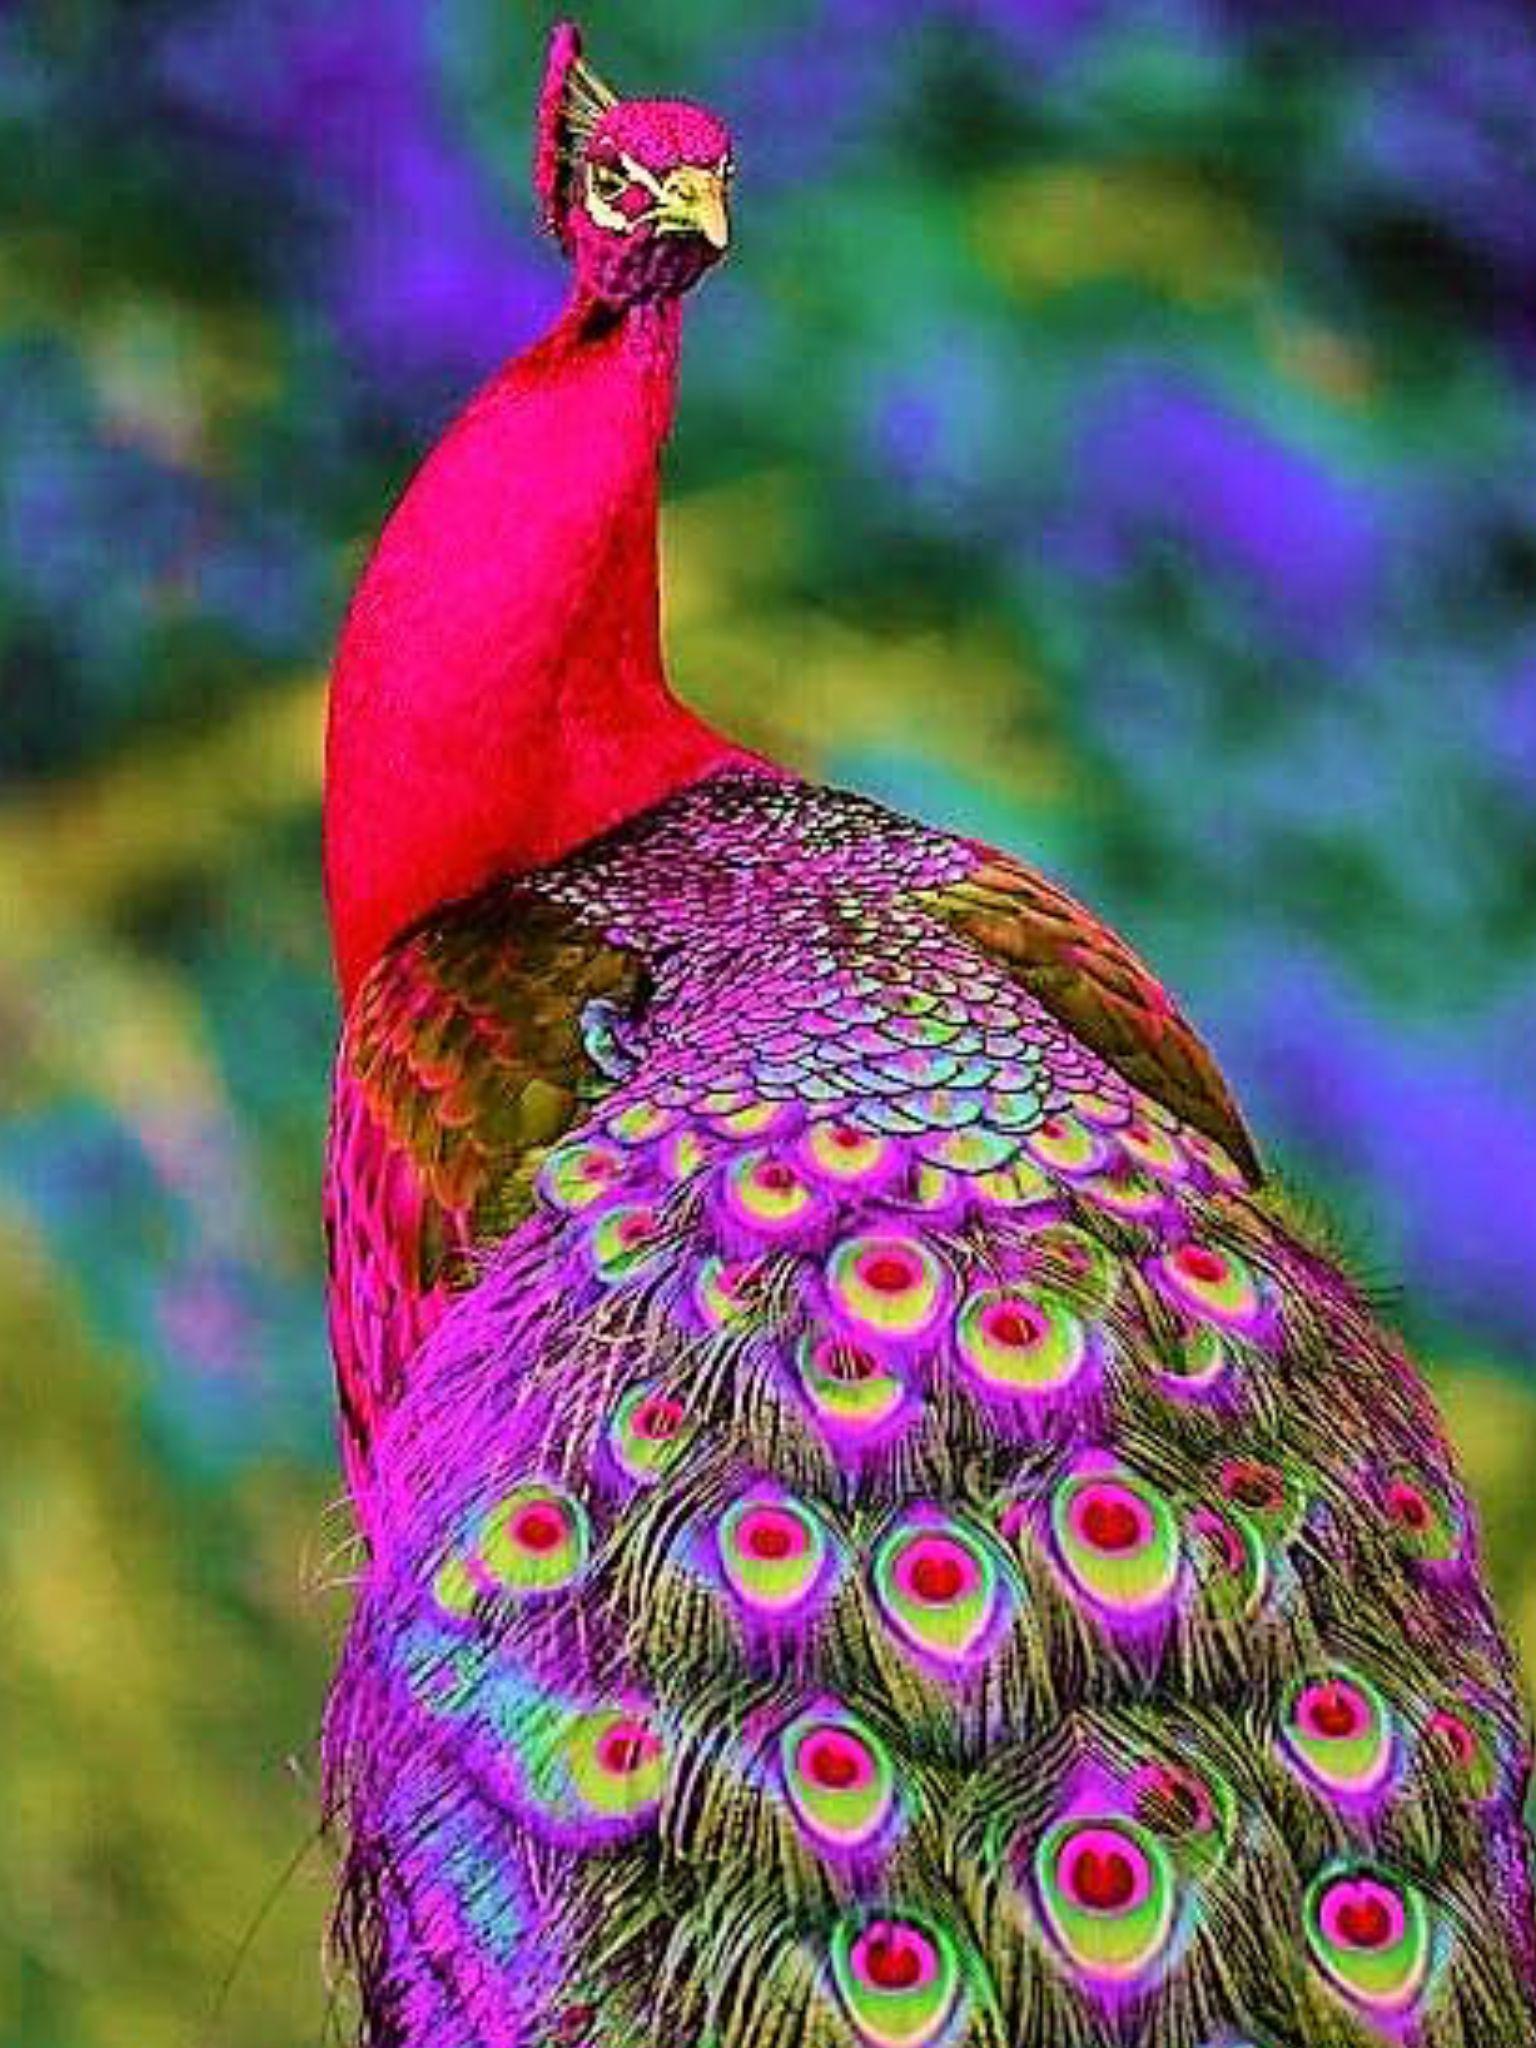 Pin by NADIA 👑 KARAM on ANIMAL♡KINGDOM Colorful birds